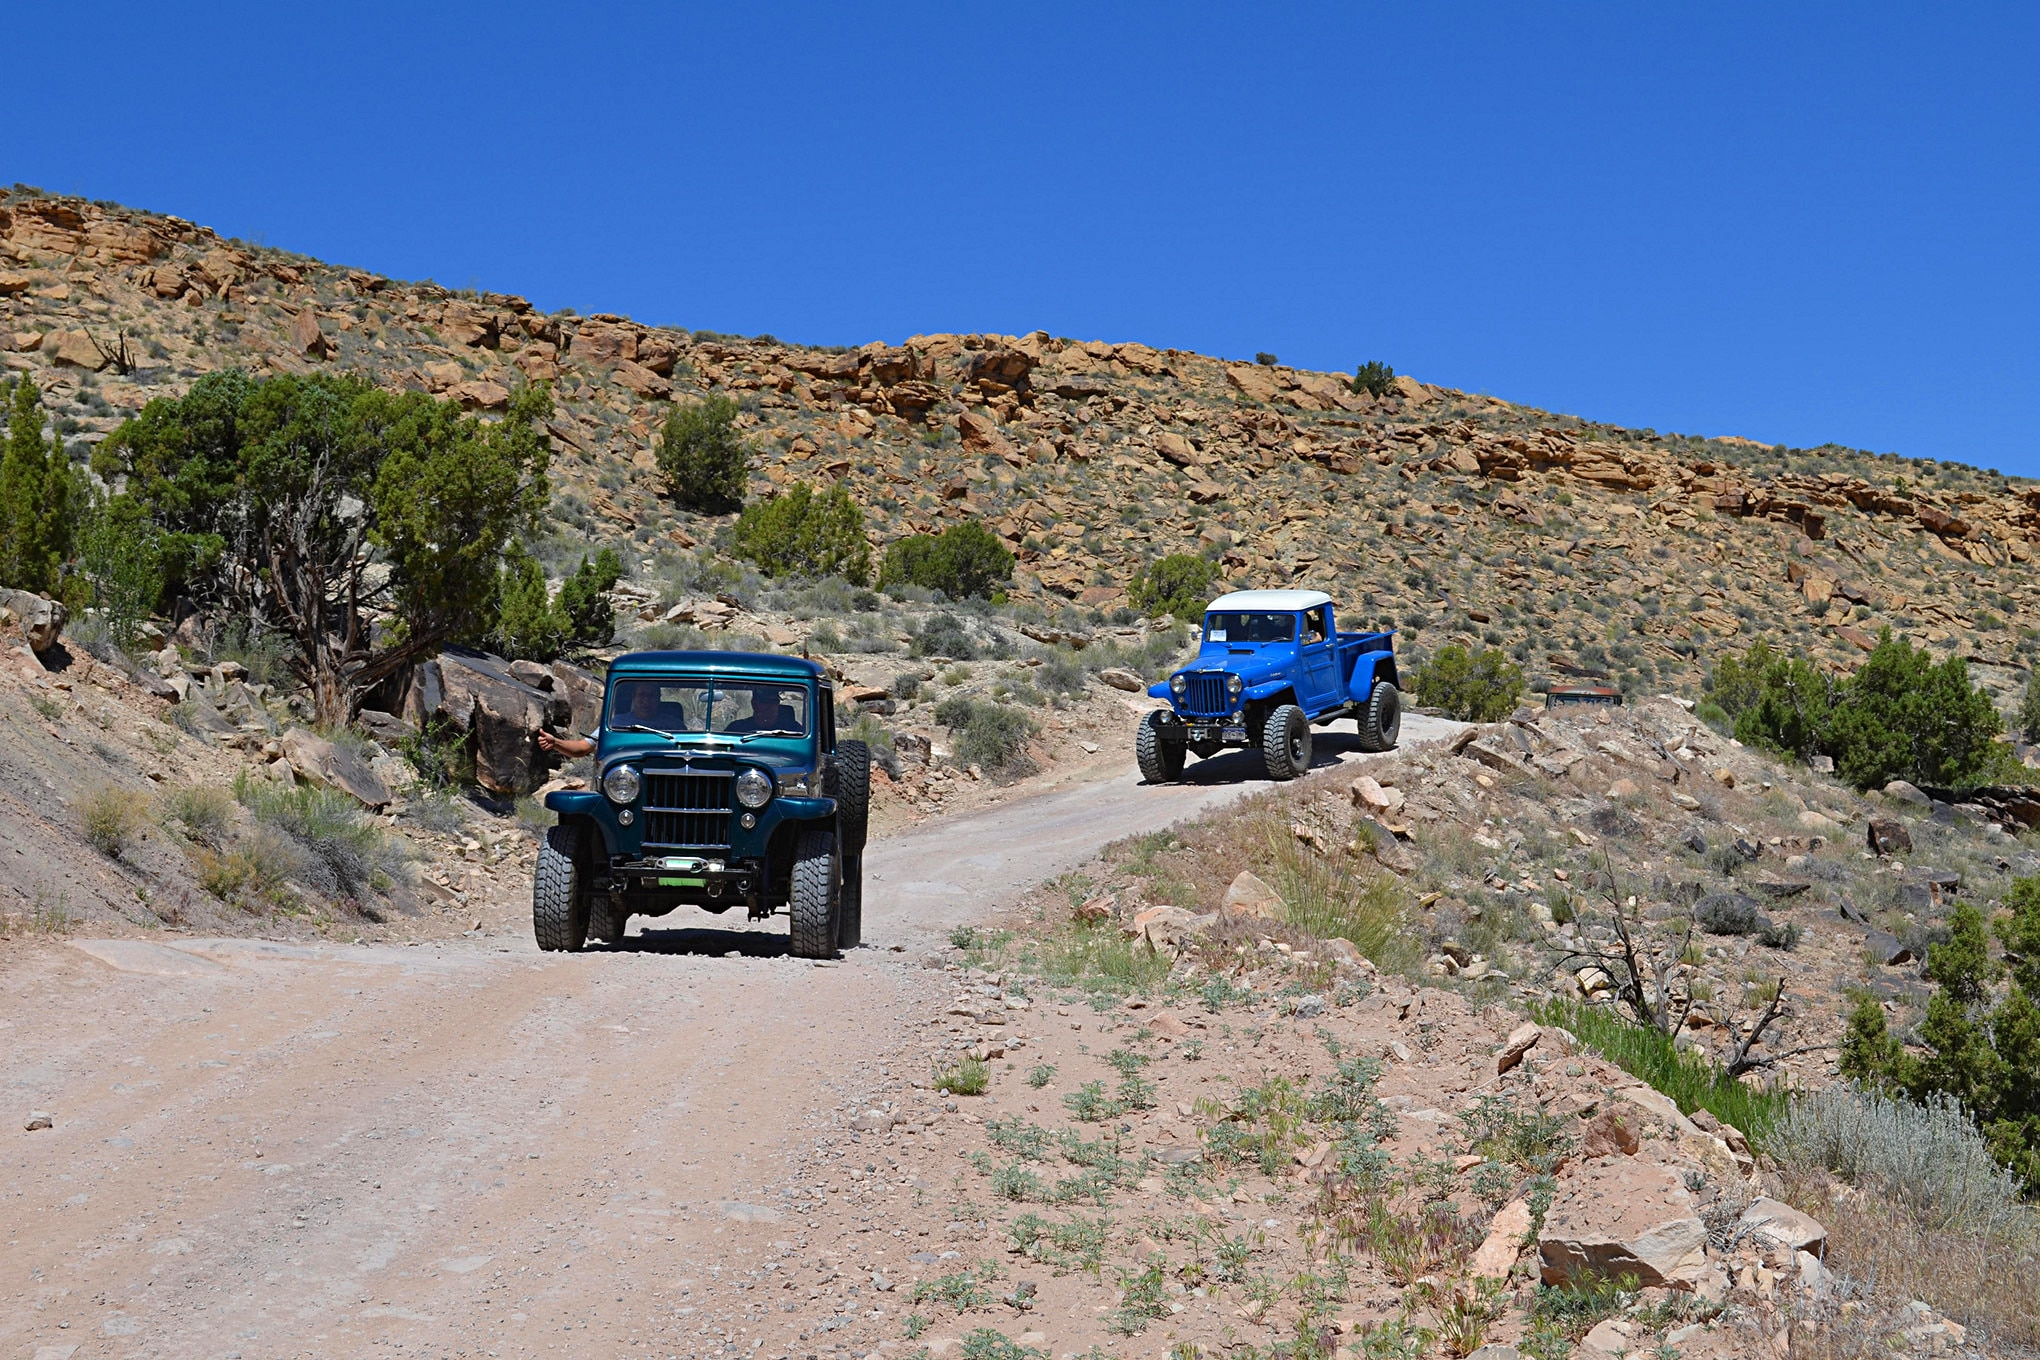 067 willys rally moab 2018 gallery.JPG